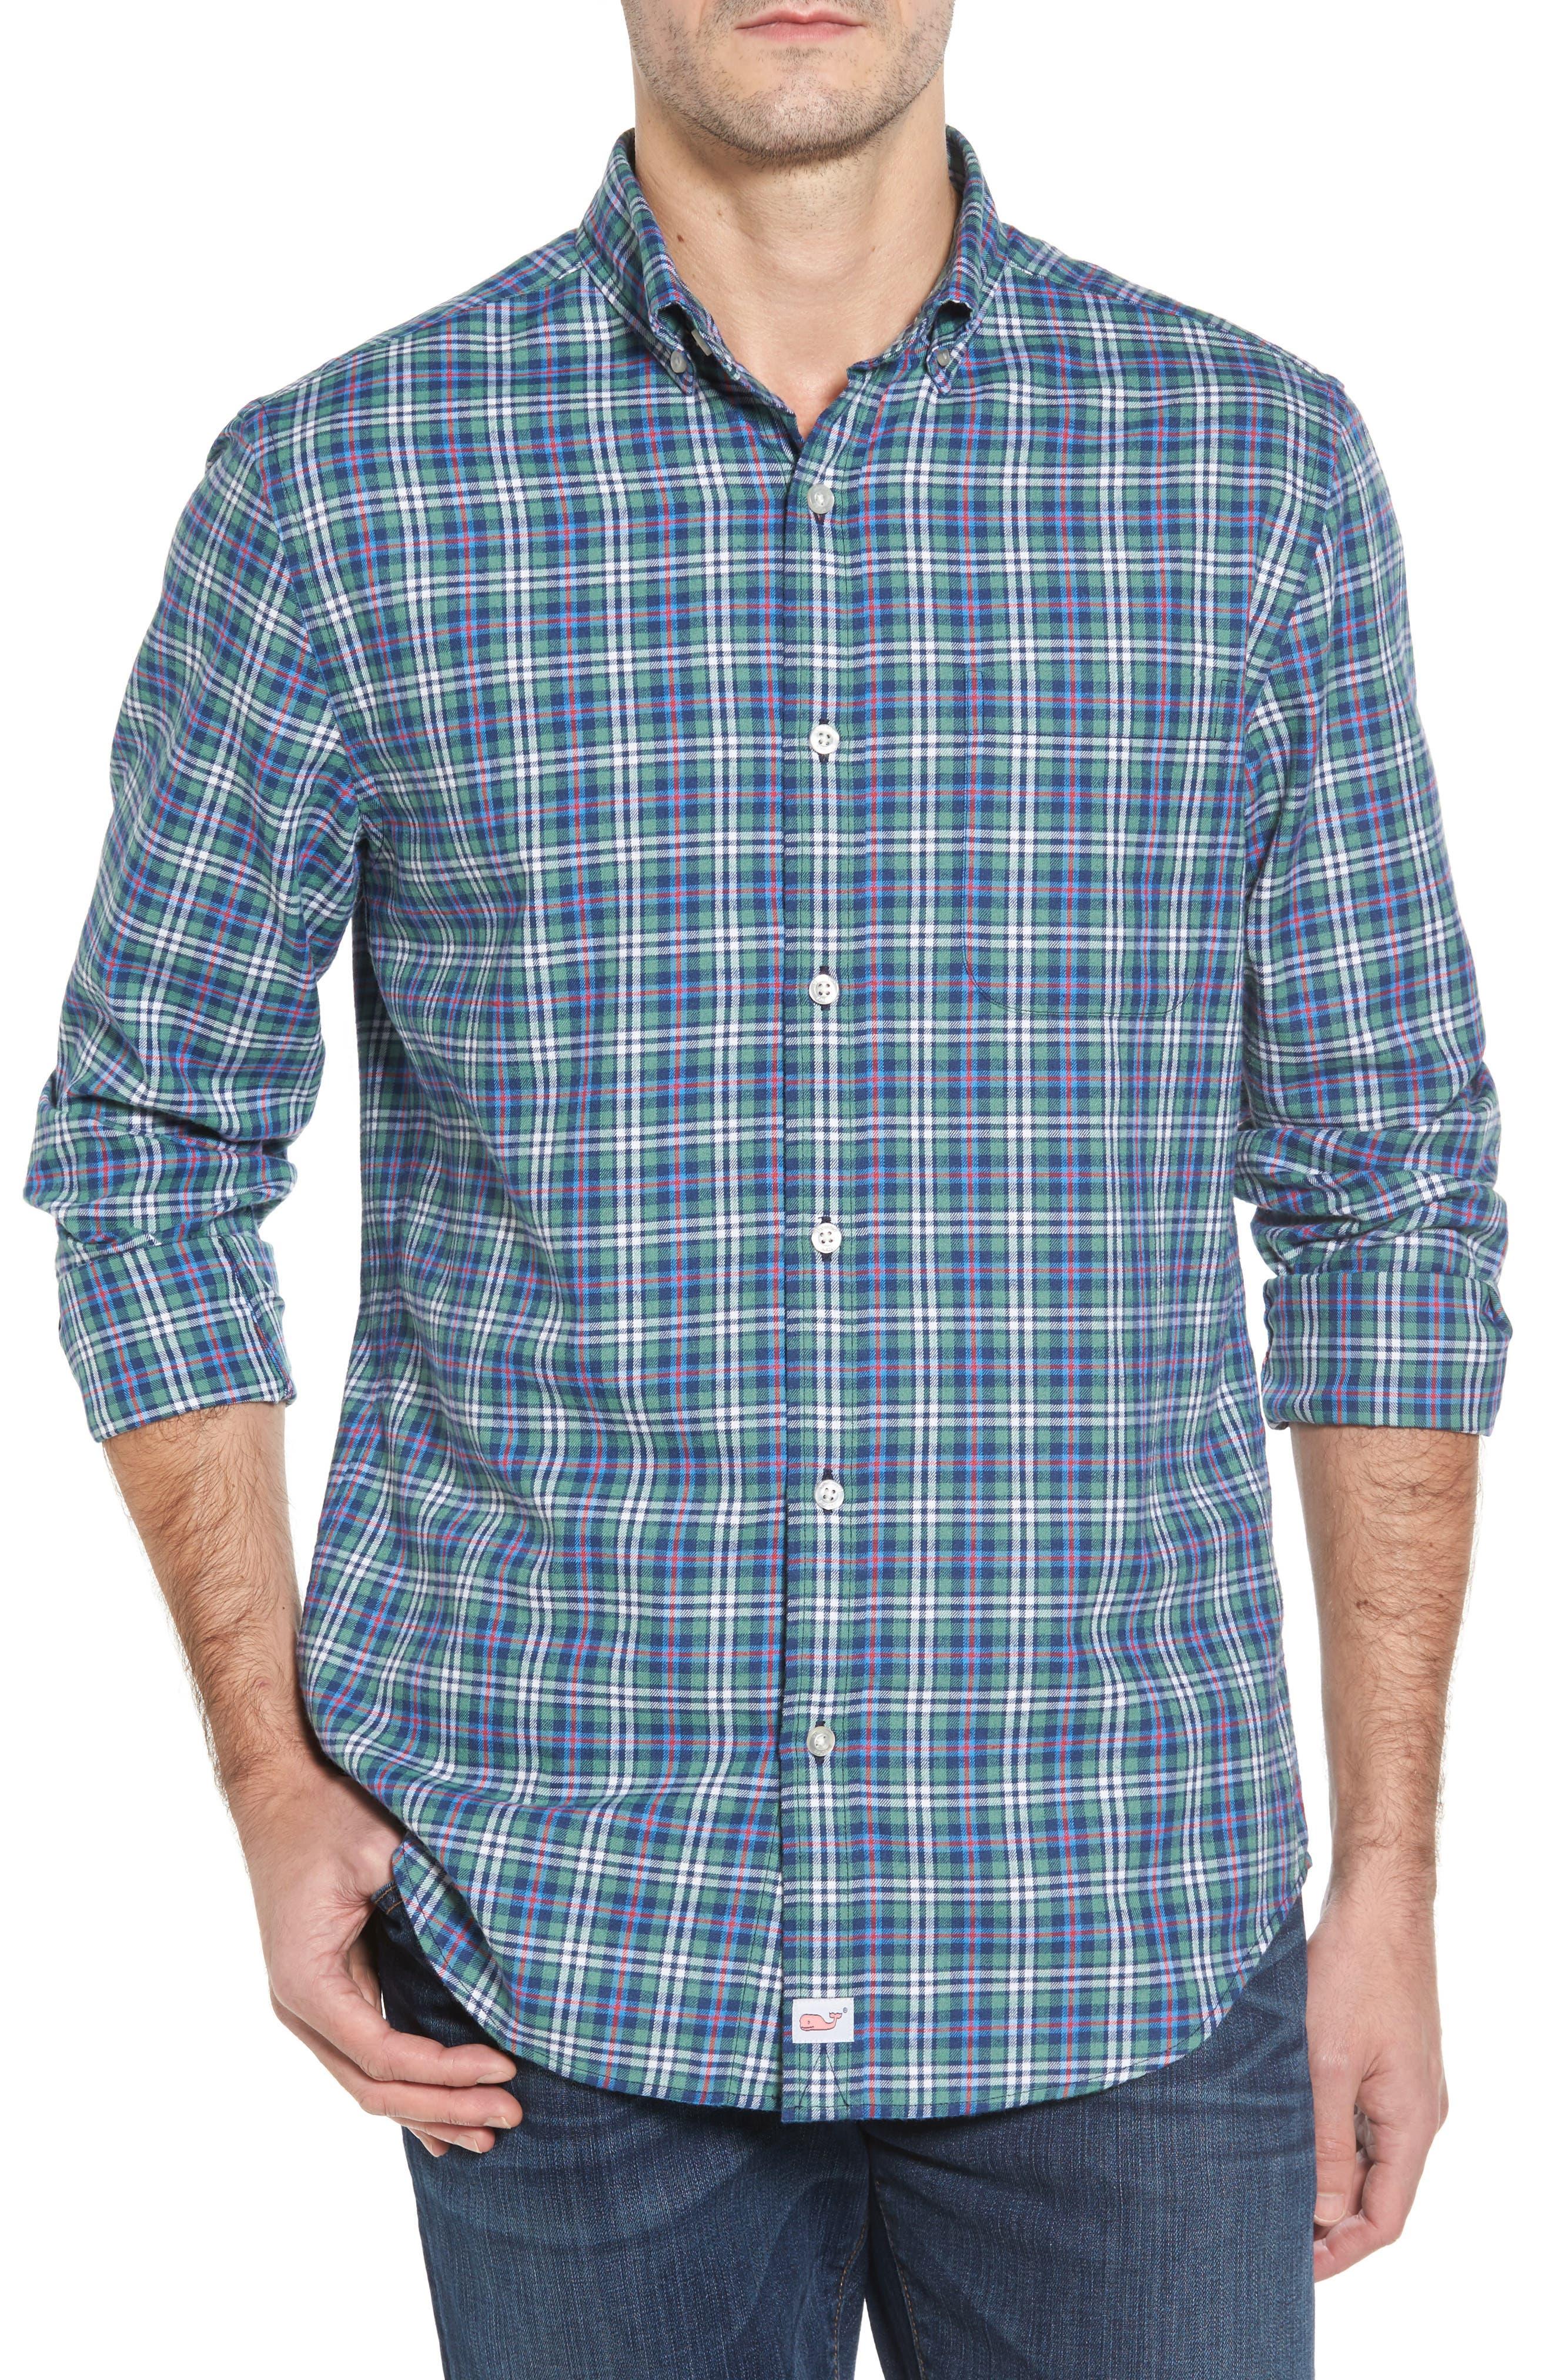 Murray Plaid Classic Fit Sport Shirt,                             Main thumbnail 1, color,                             303